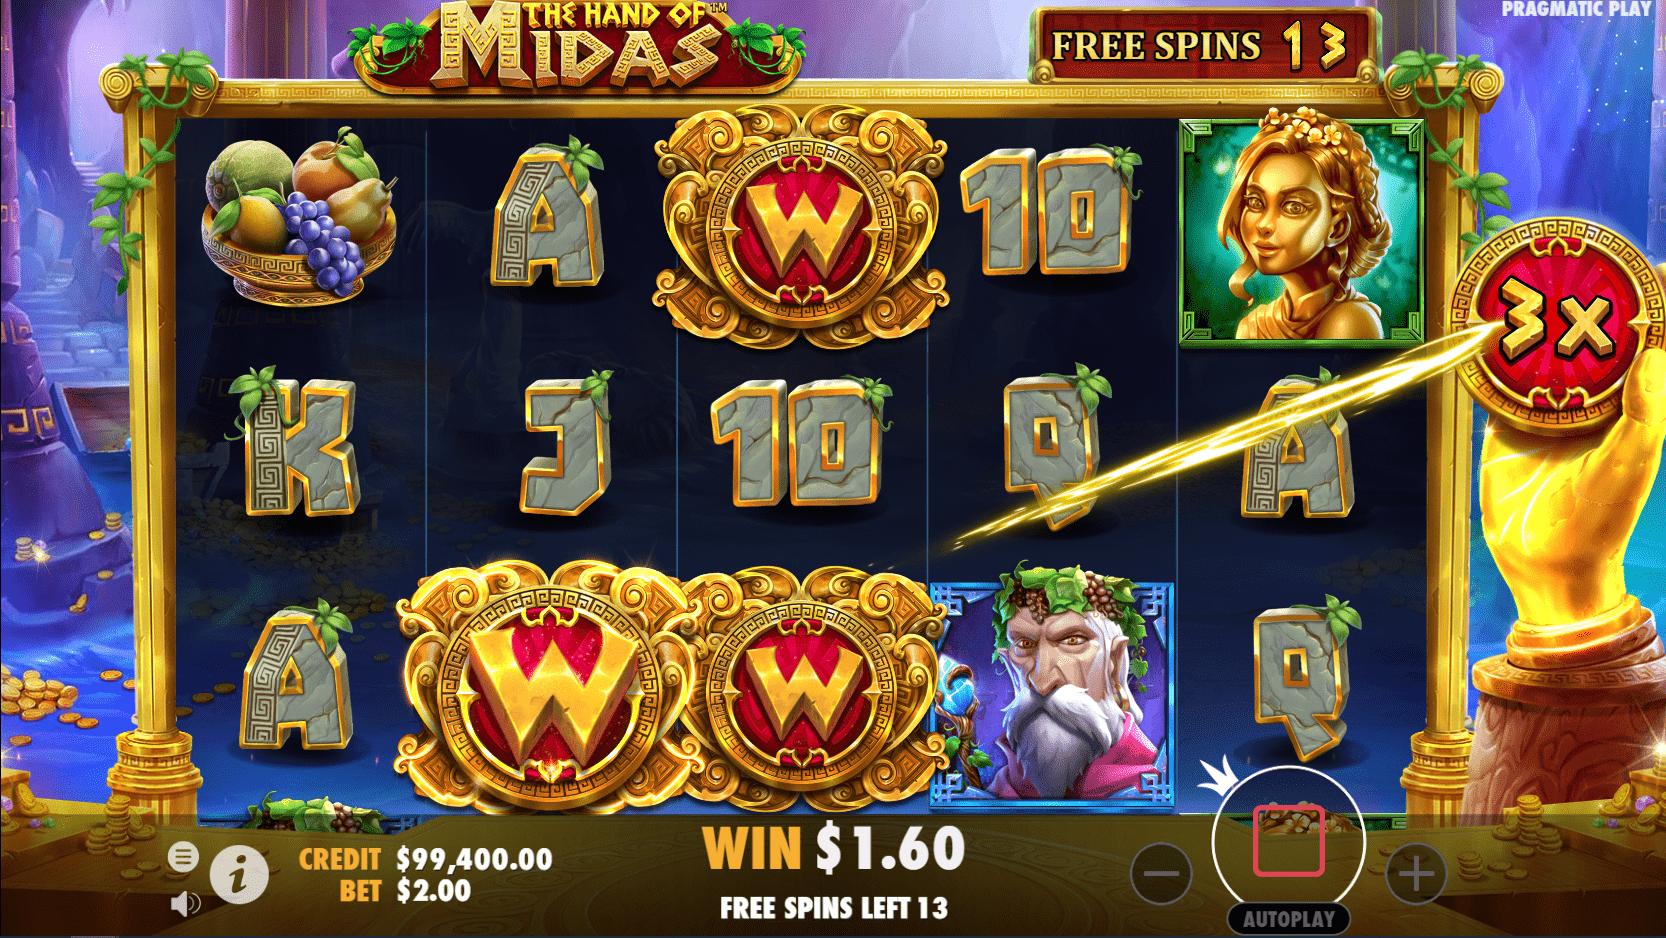 The Hand of Midas Slot Machine Free Spins Sticky Wilds